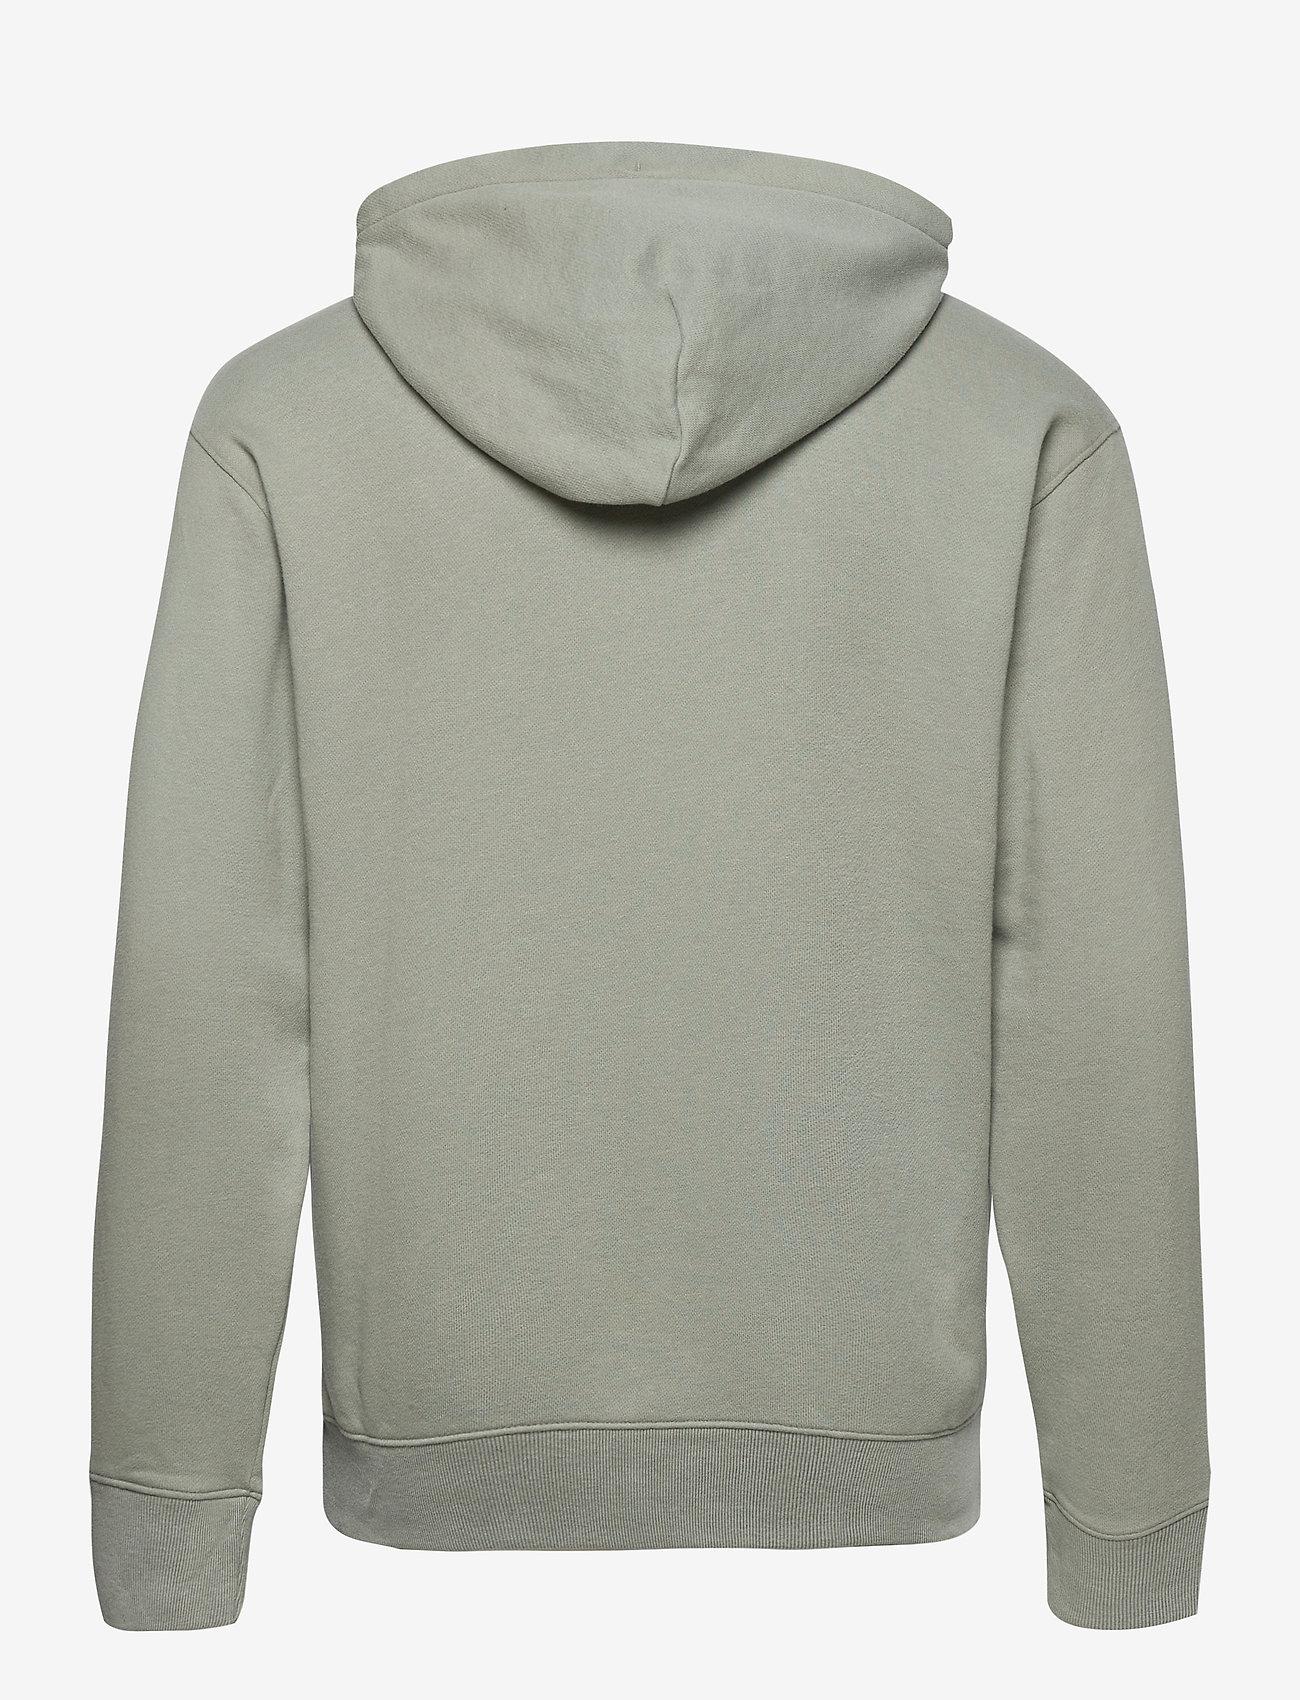 Hollister HCo. GUYS SWEATSHIRTS - Sweatshirts OLIVE DD - Menn Klær